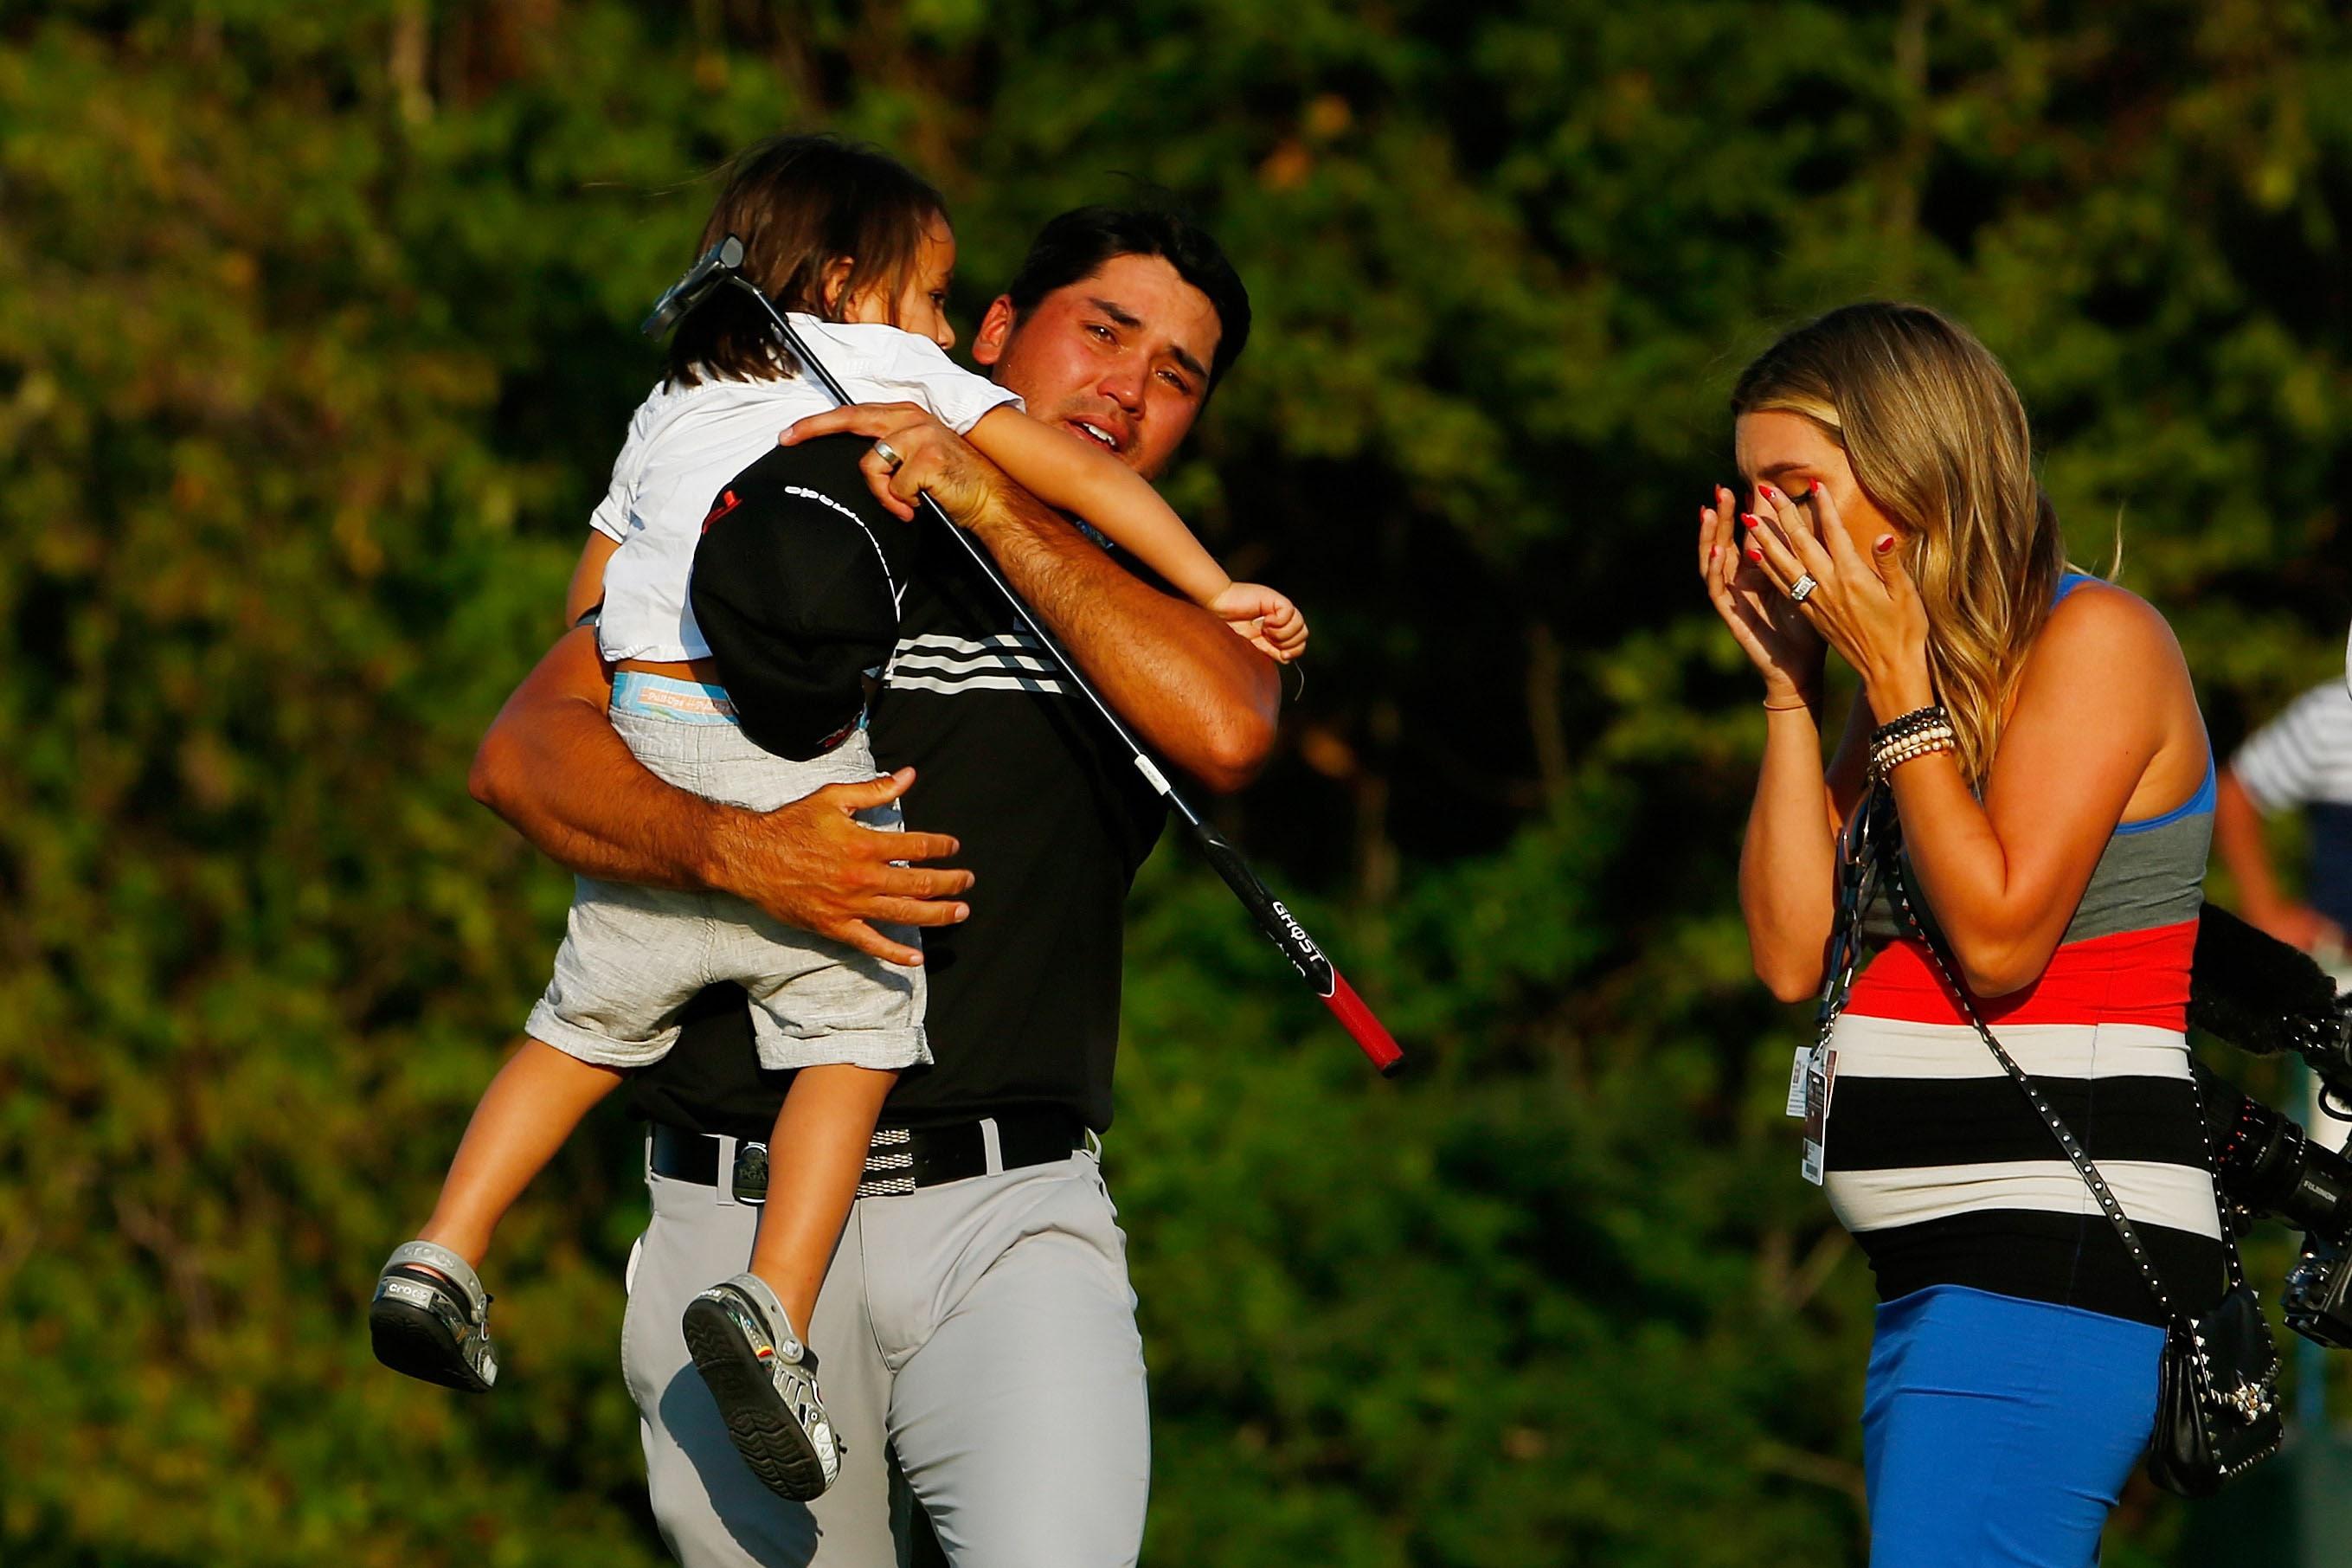 4. Jason Day wins the PGA Championship